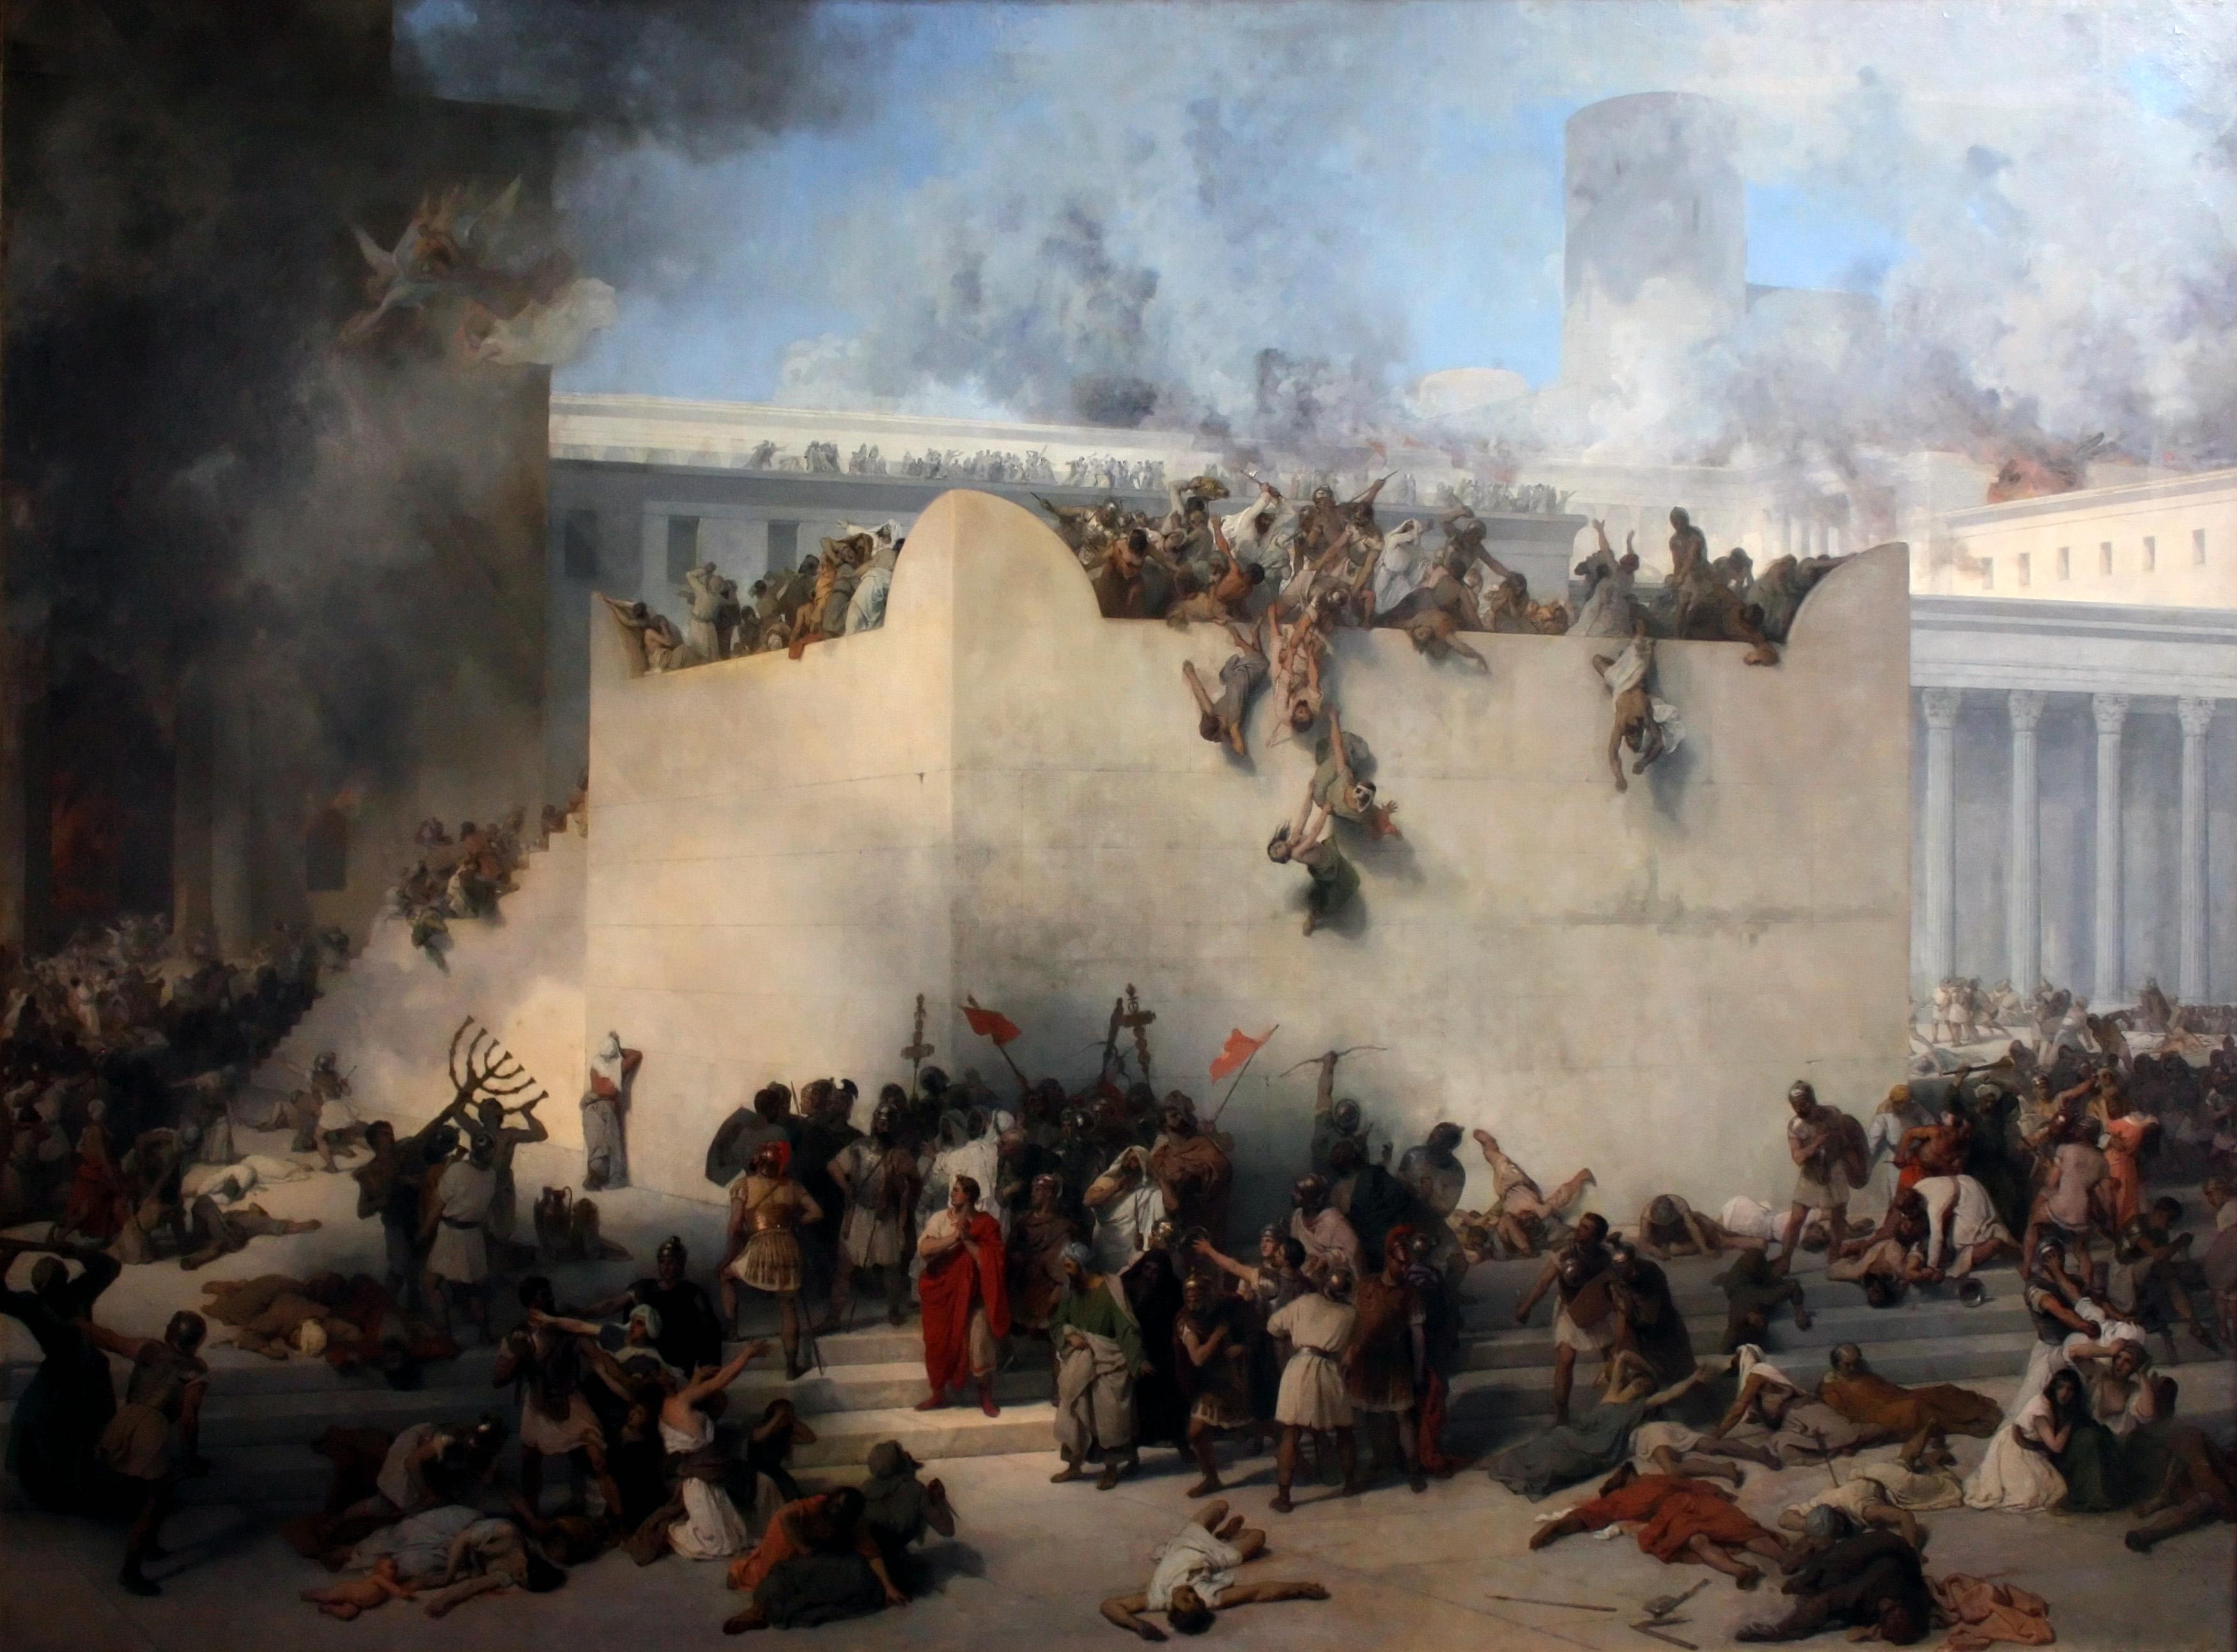 Francesco Hayez - Distruzione del tempio di Gerusalemme - 1867